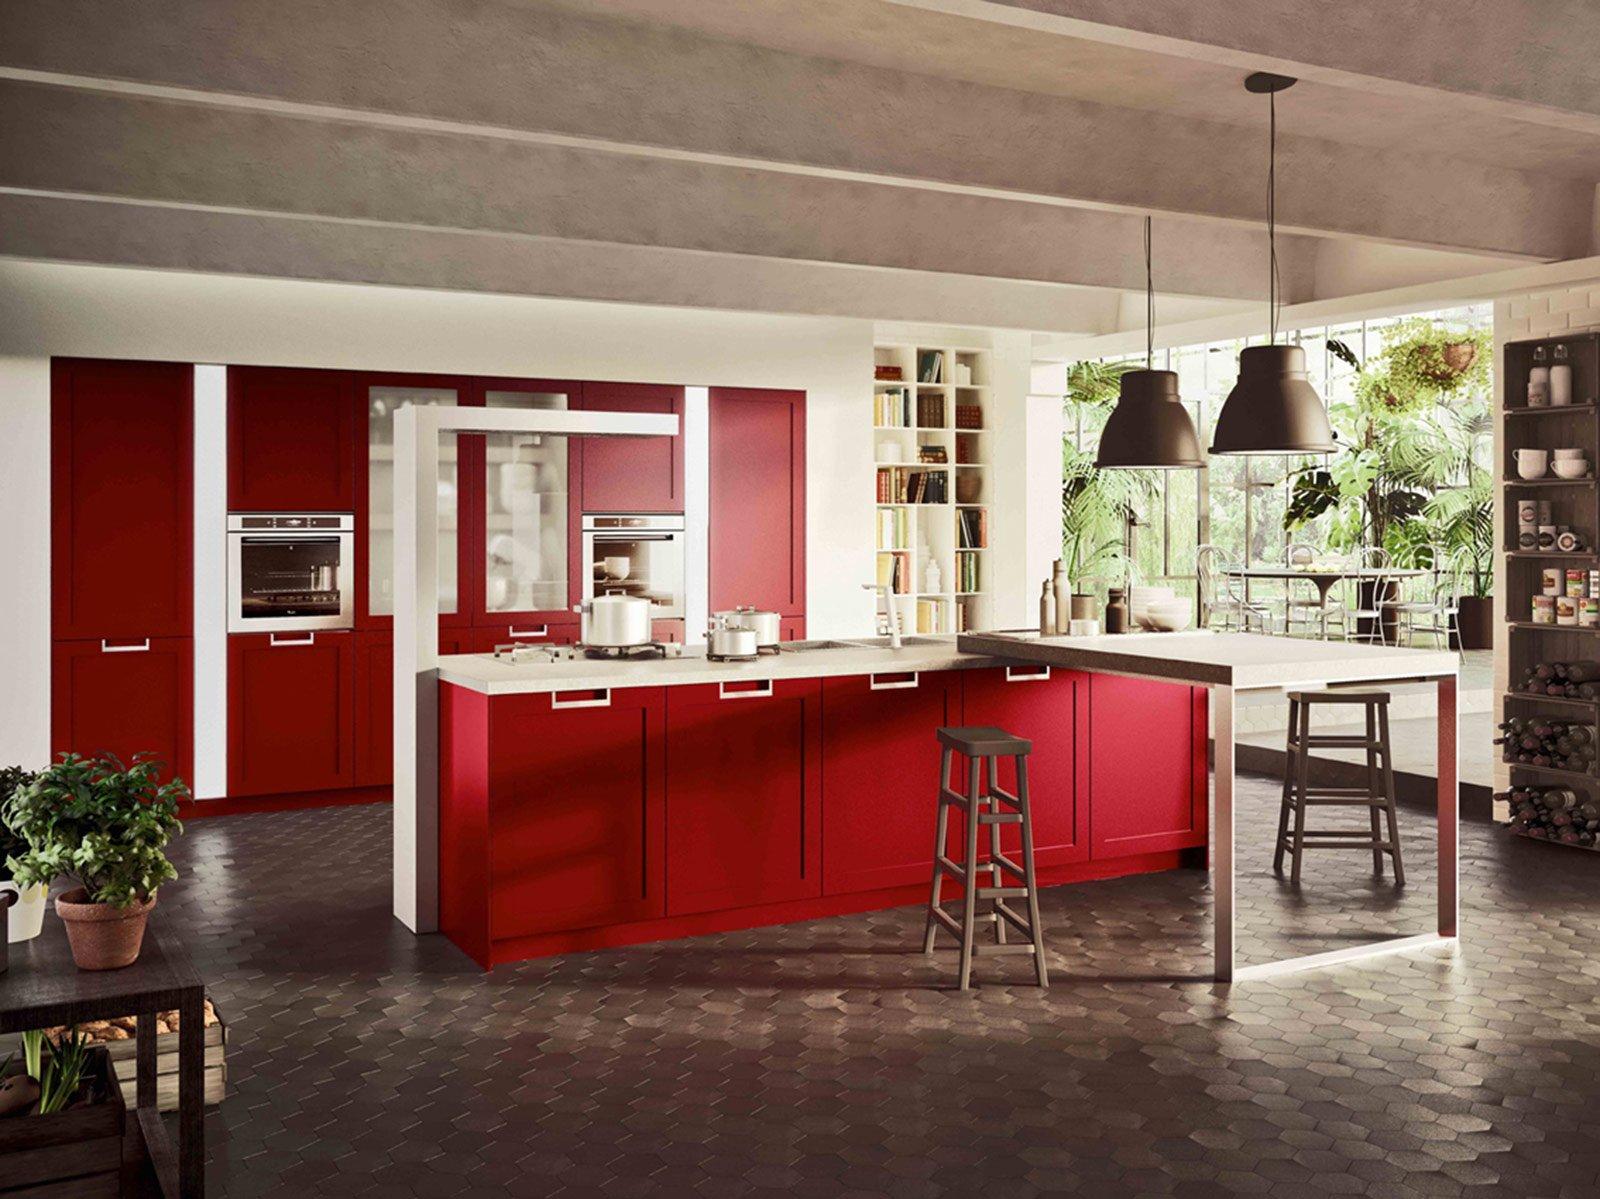 Cucine colori fluo per arredarla cose di casa - Colori per cucina piccola ...